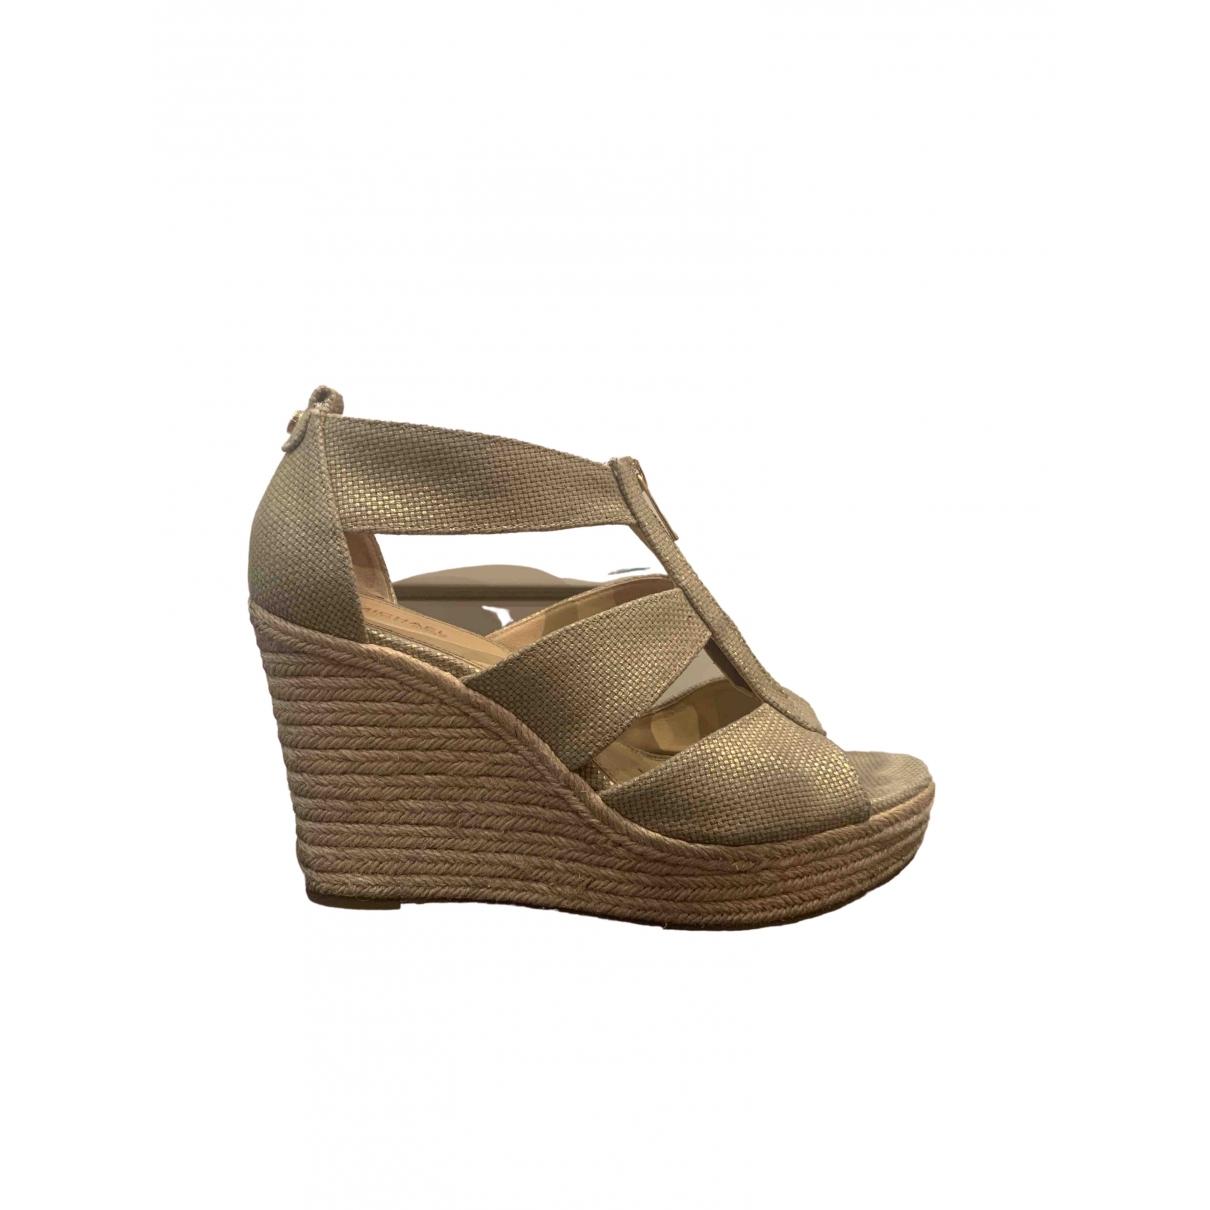 Michael Kors \N Gold Cloth Sandals for Women 9 US